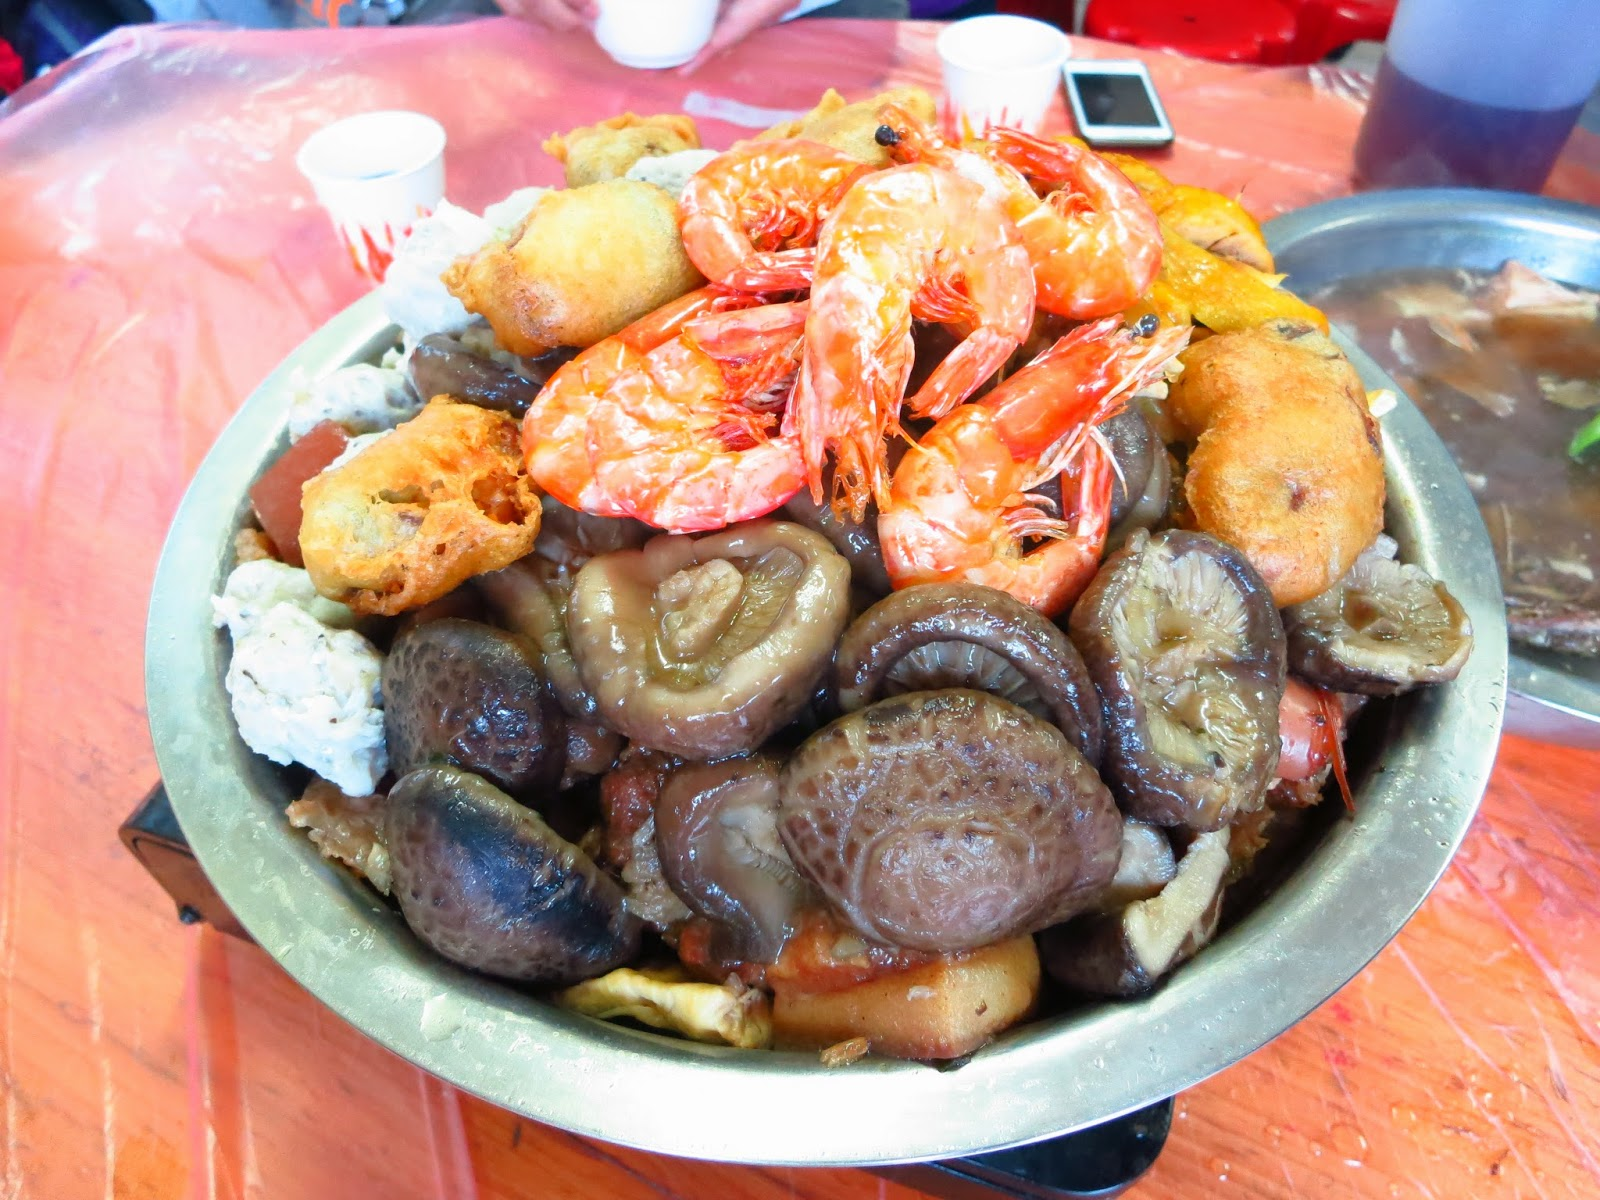 jj......life of an ordinary: 屏山傳統盆菜@元朗 - 臨時盆菜